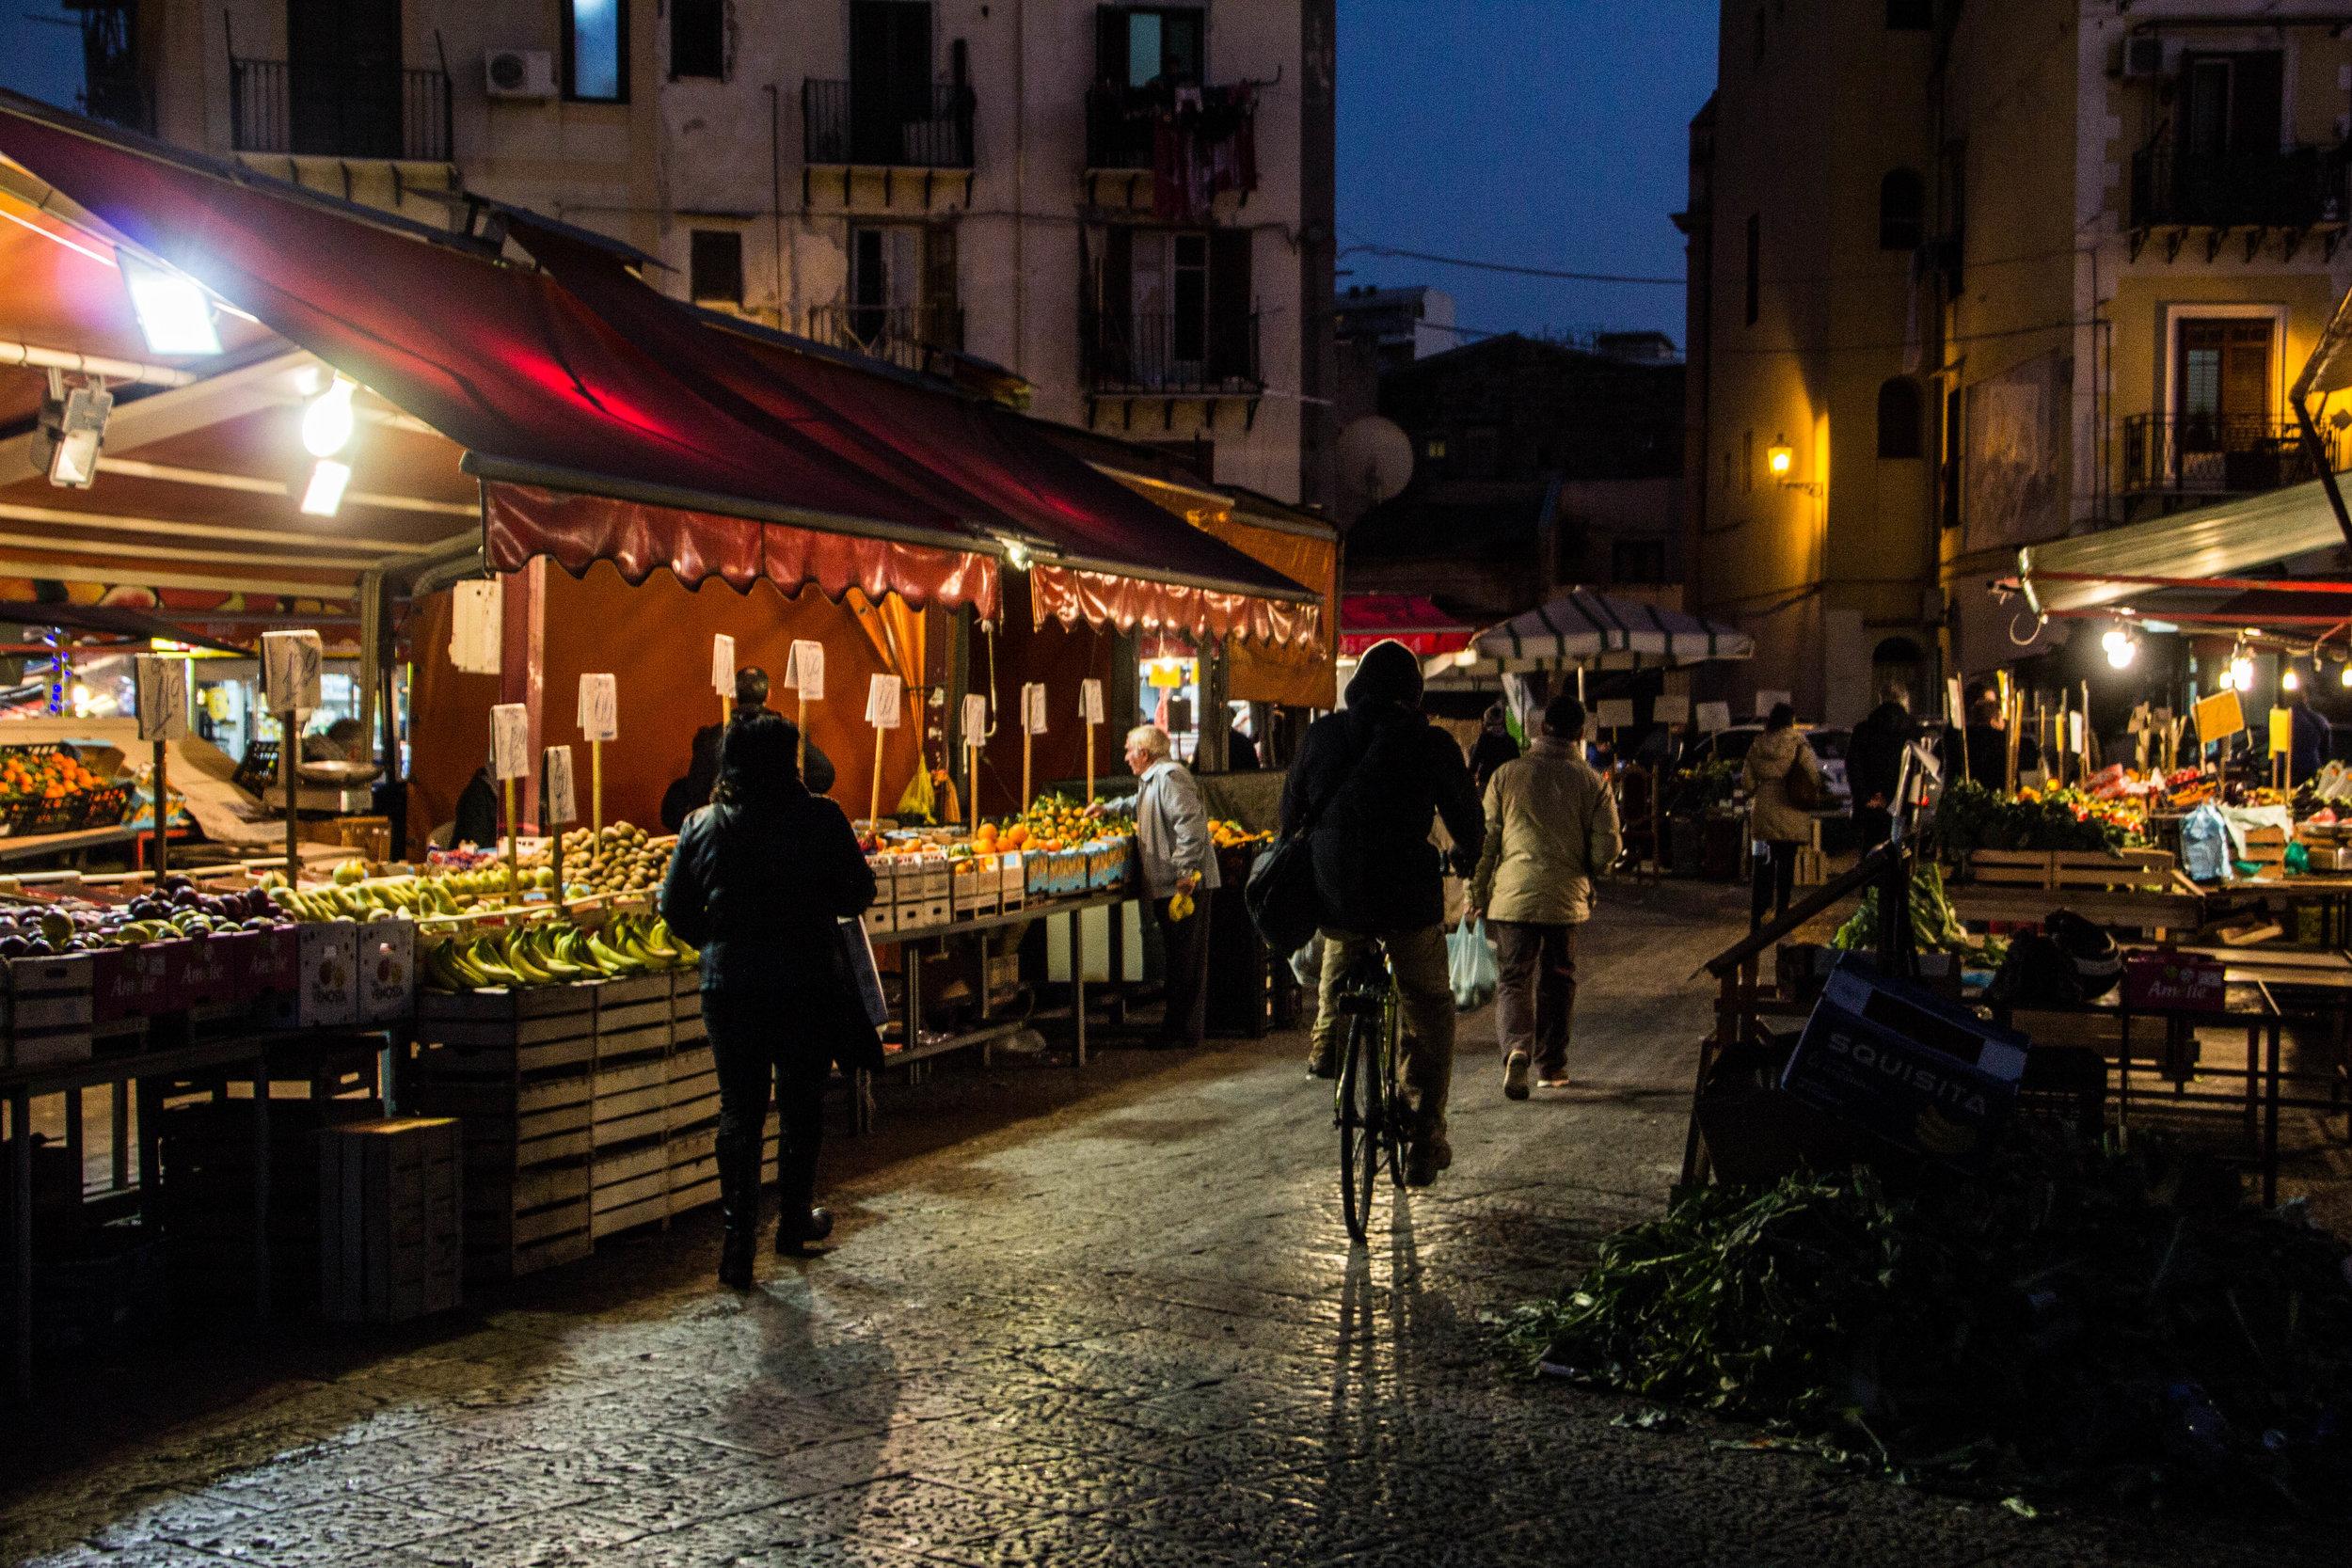 night-street-market-palermo-sicily-4.jpg